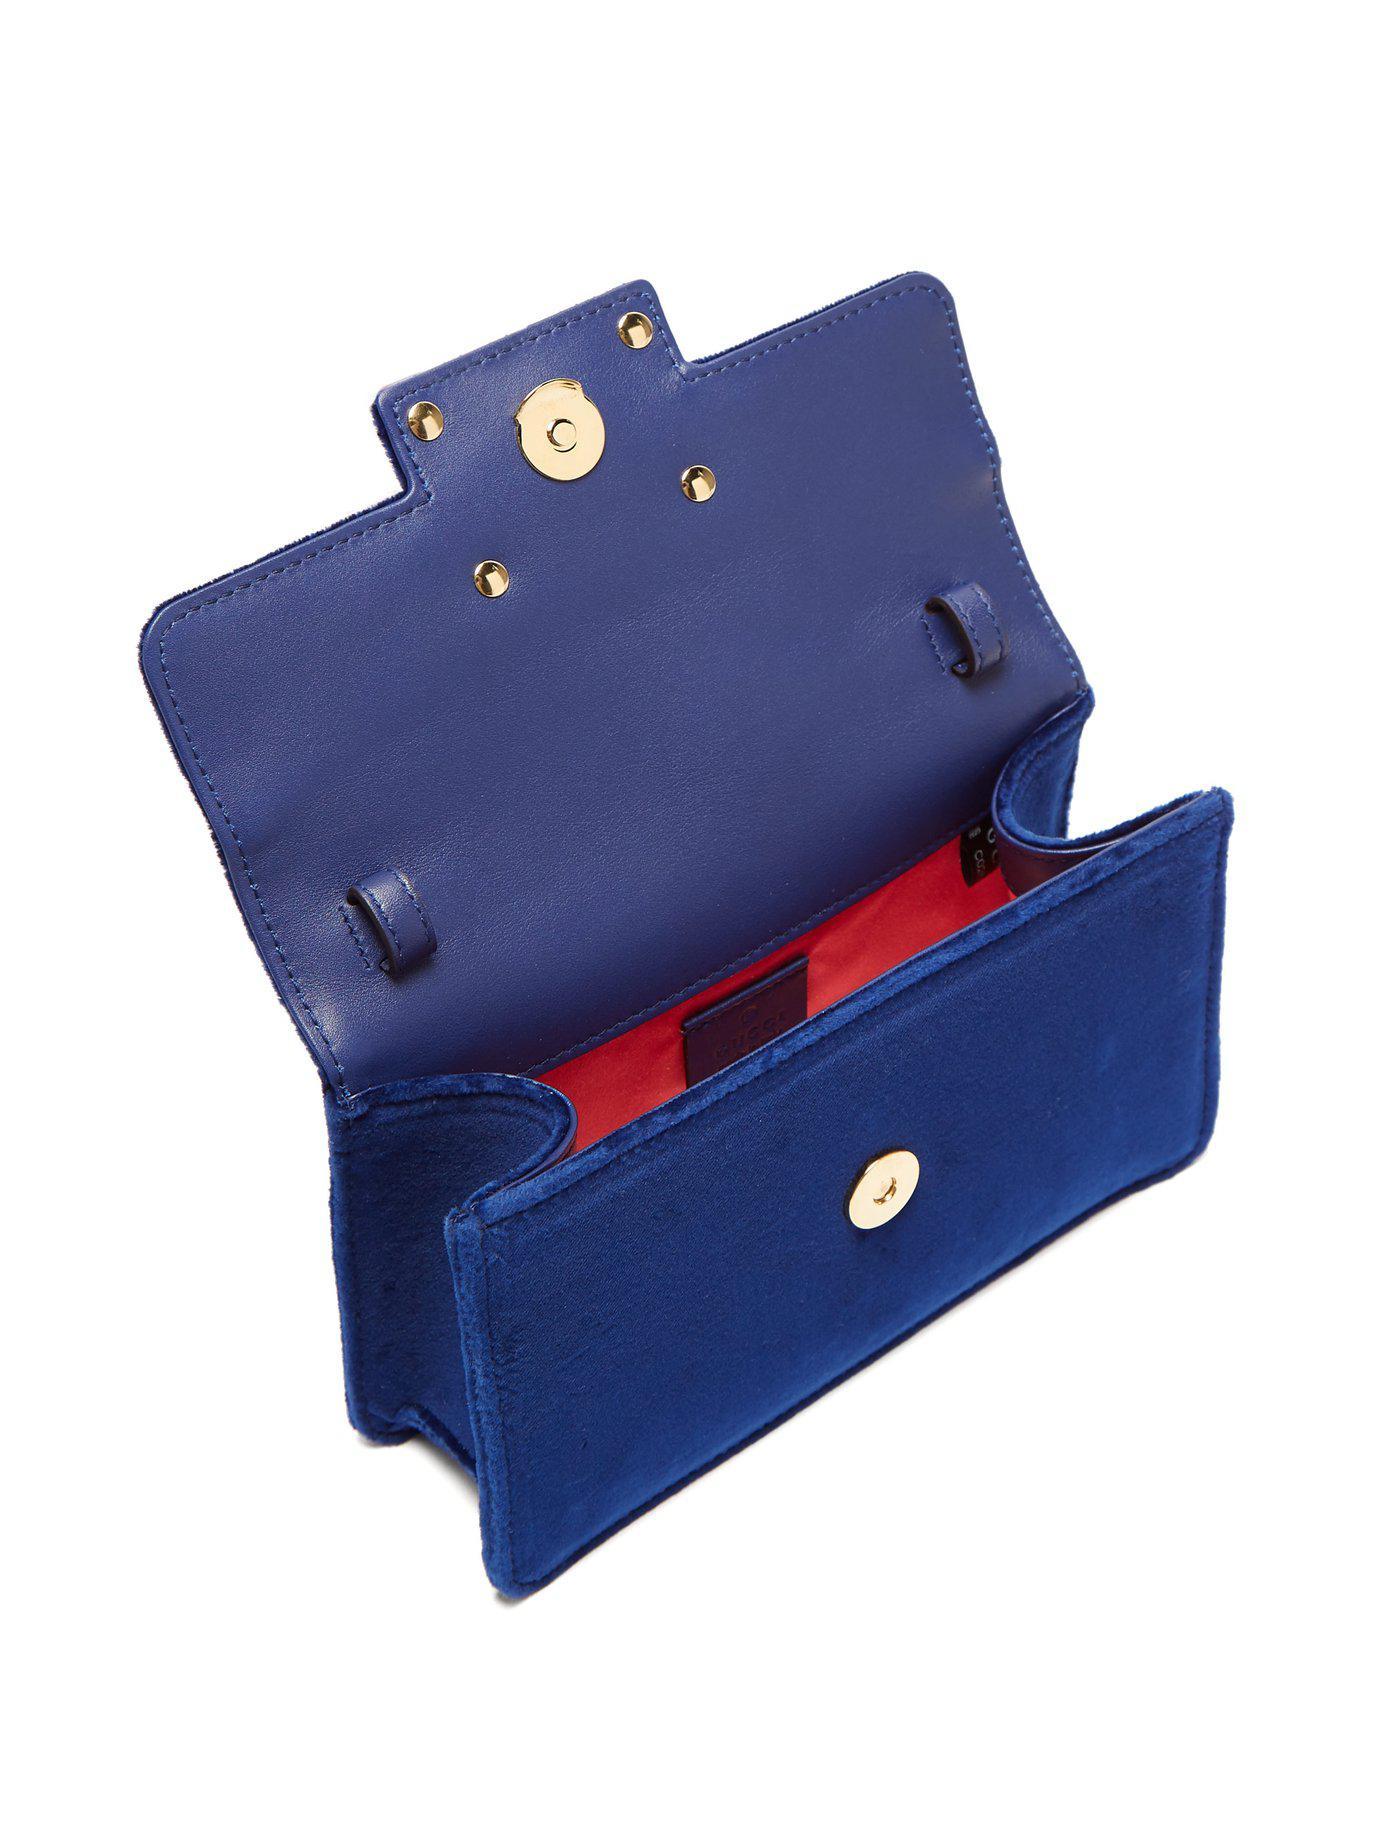 a47150667dea Gucci - Blue Broadway Crystal G Velvet Cross Body Bag - Lyst. View  fullscreen